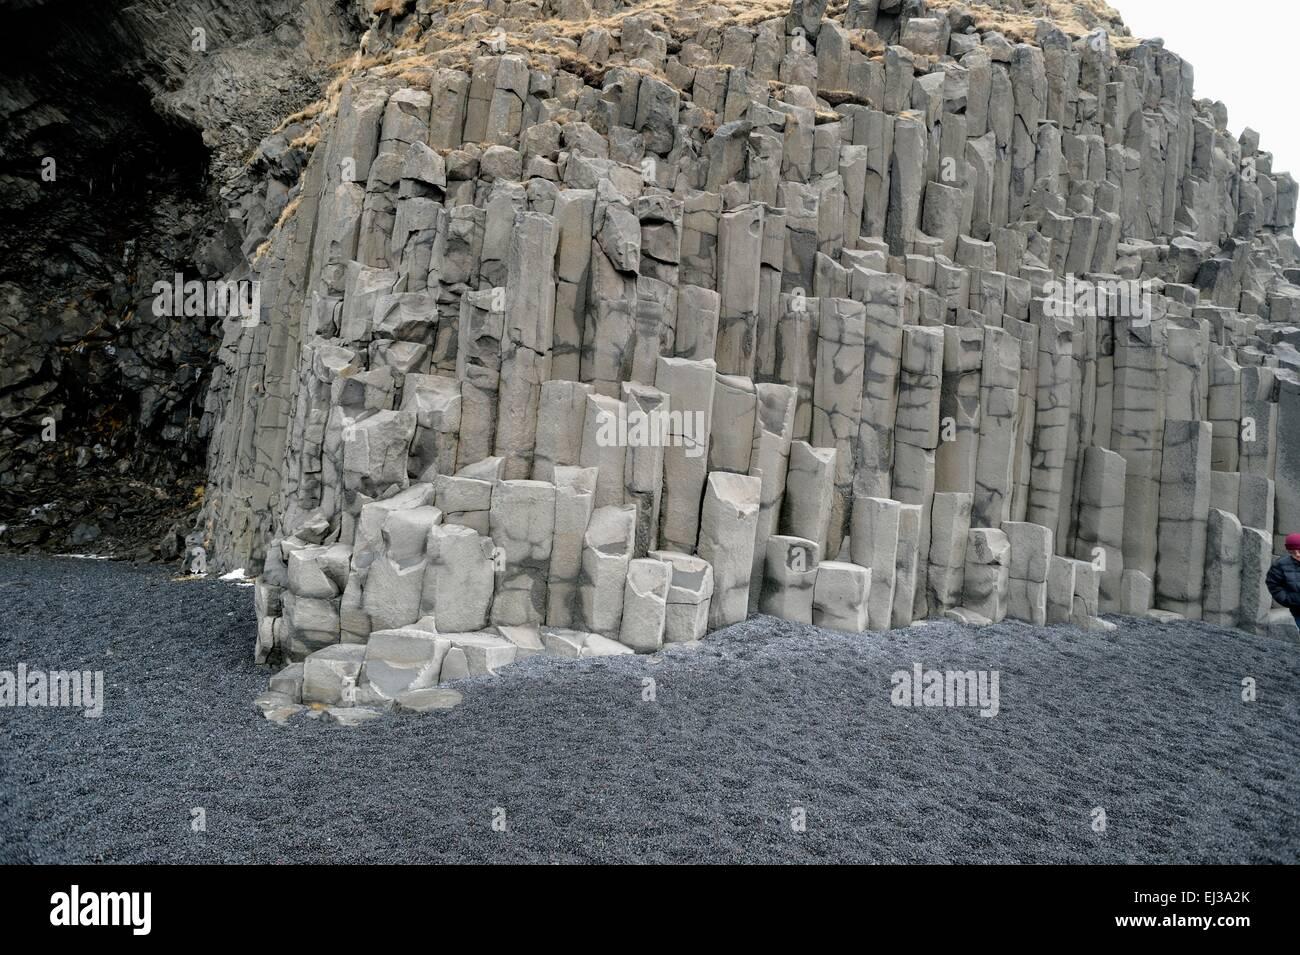 Volcanic Basalt columns on Iceland beach - Stock Image